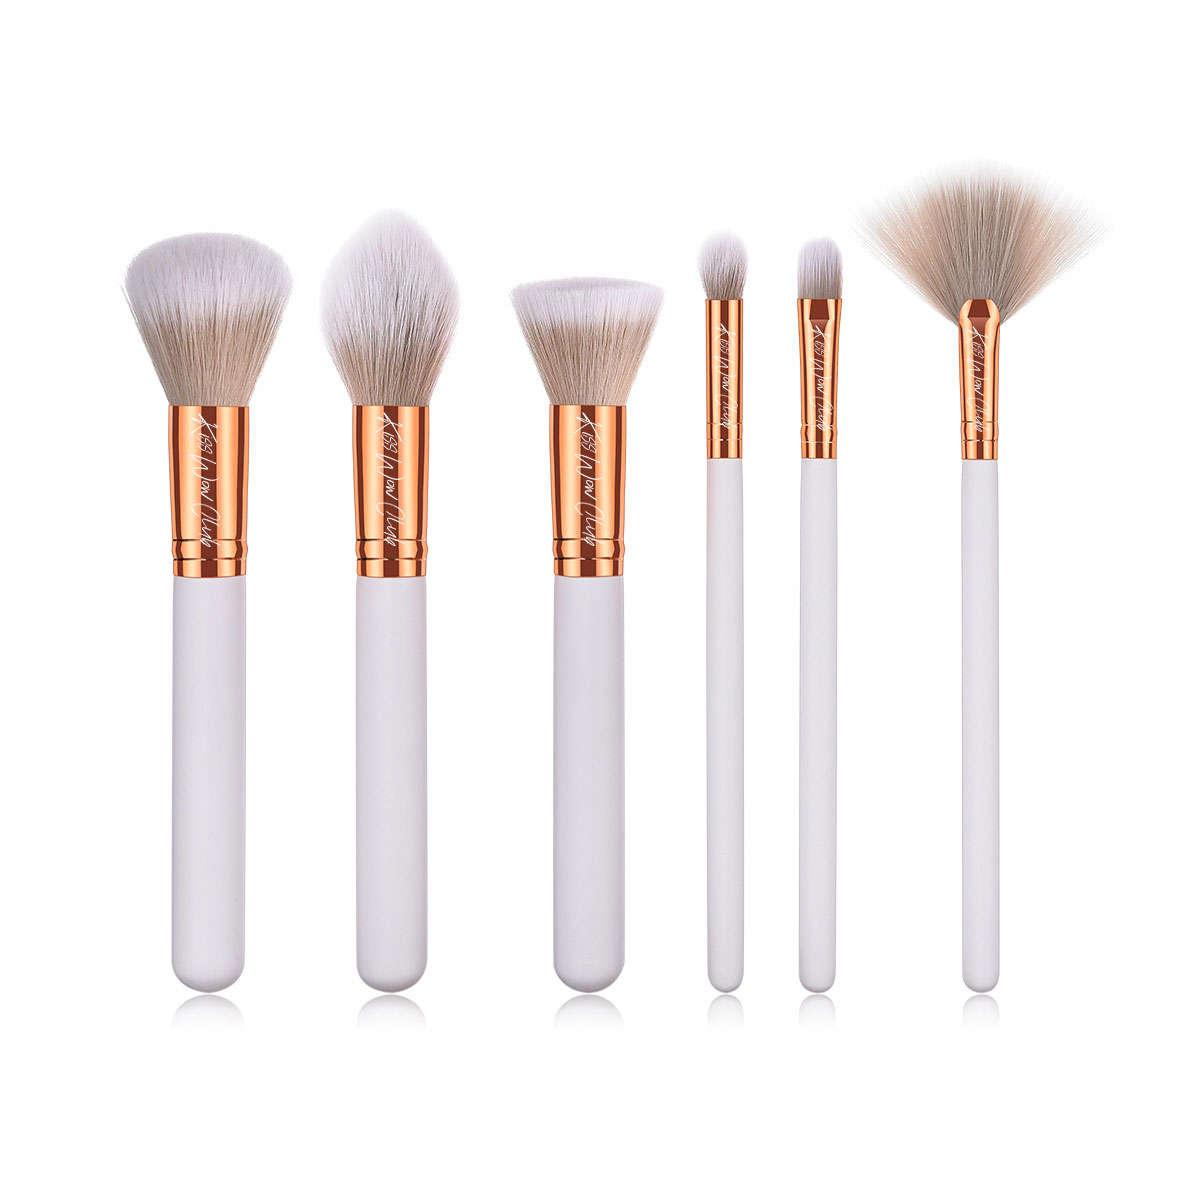 Kiss Wow club White Sable Makeup Brush Set